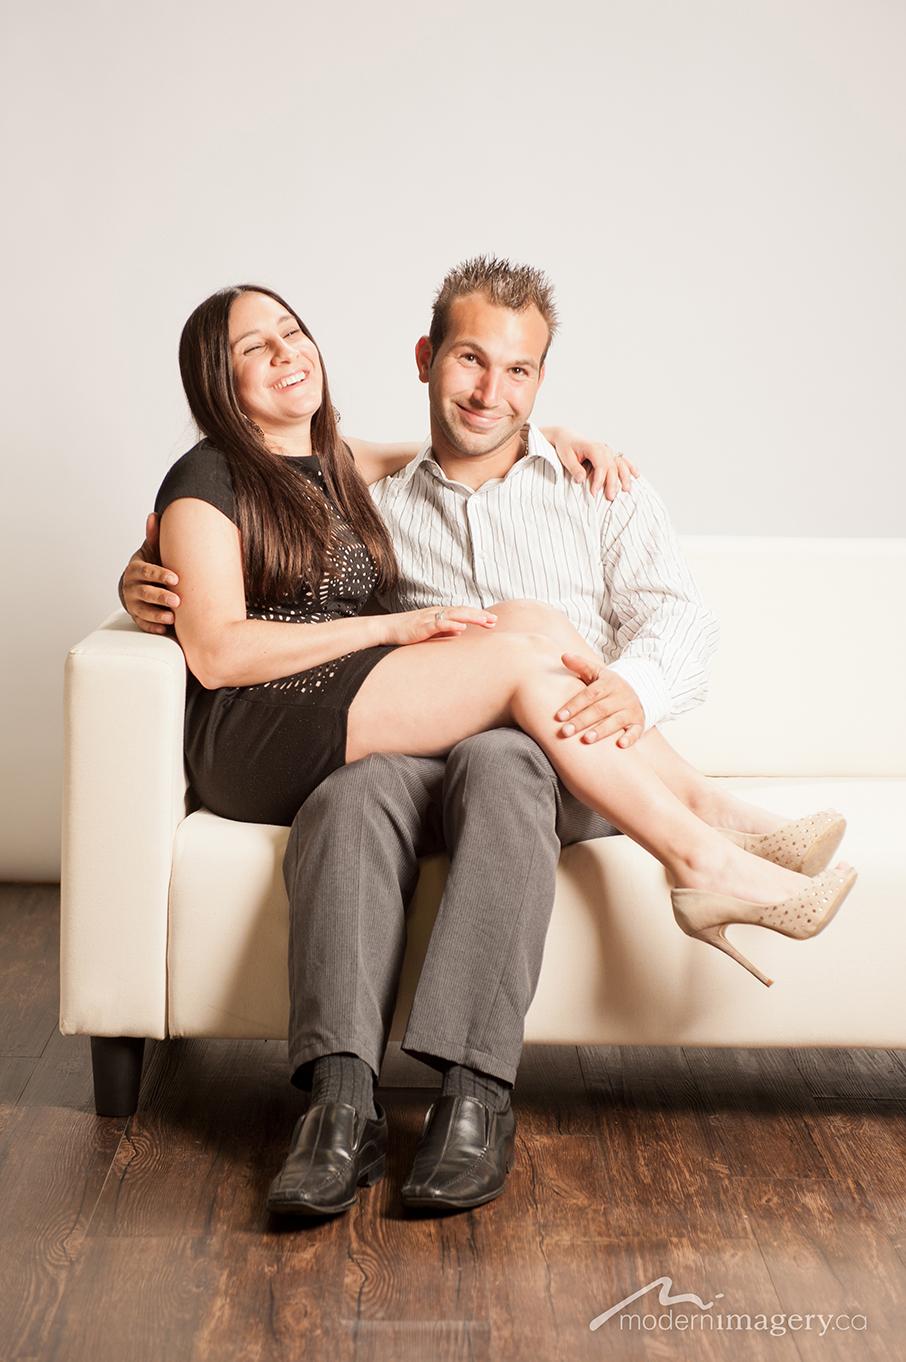 Rita&Tomasso-9.jpg